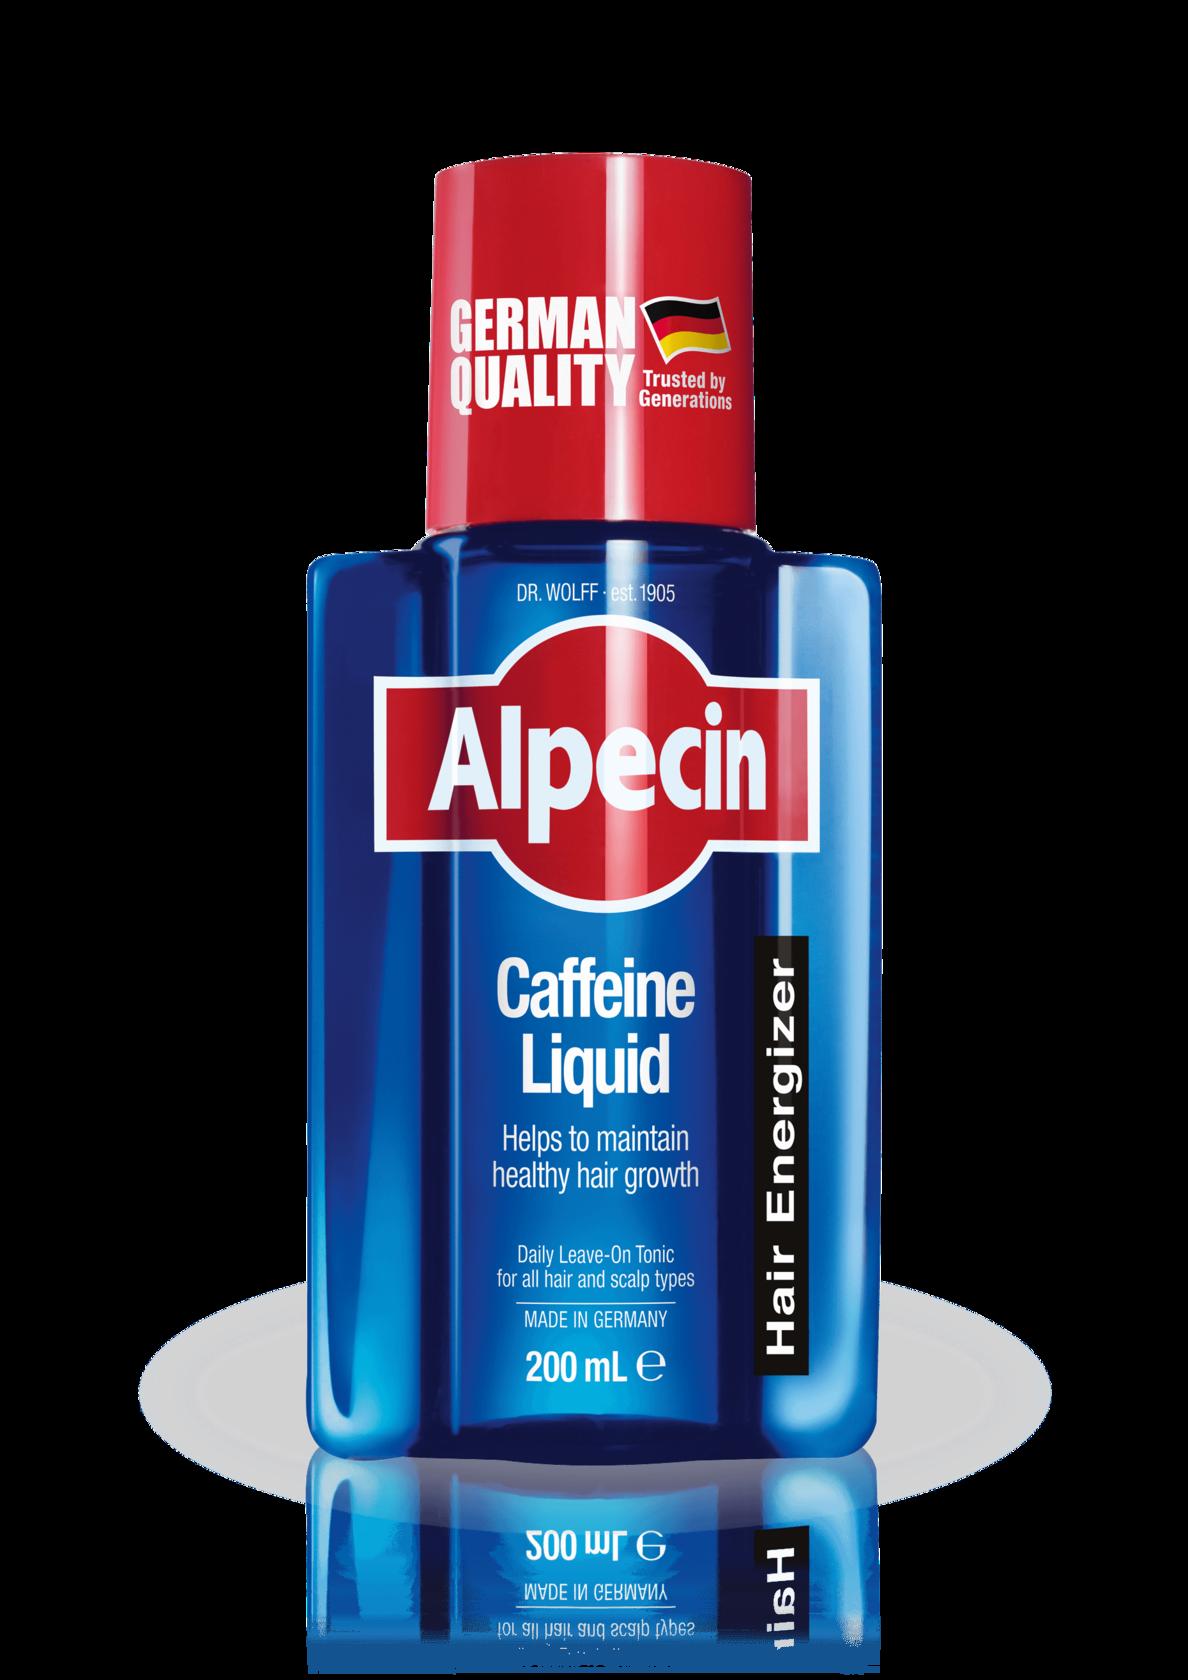 Shampoo clipart liquid thing. Alpecin caffeine helps to